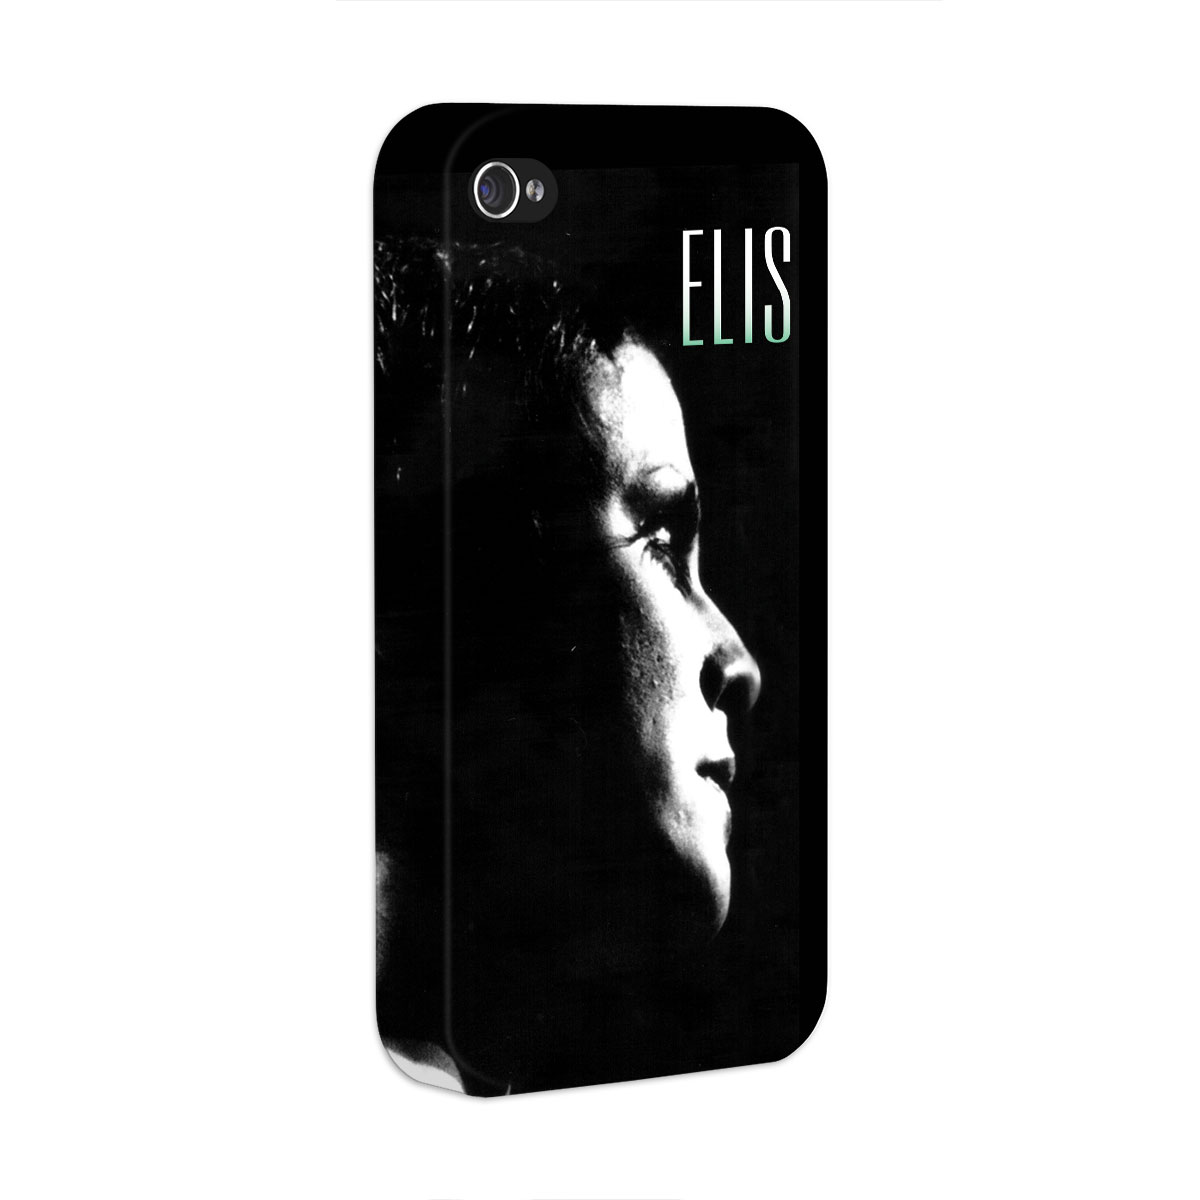 Capa de iPhone 4/4S Elis Regina Perfil